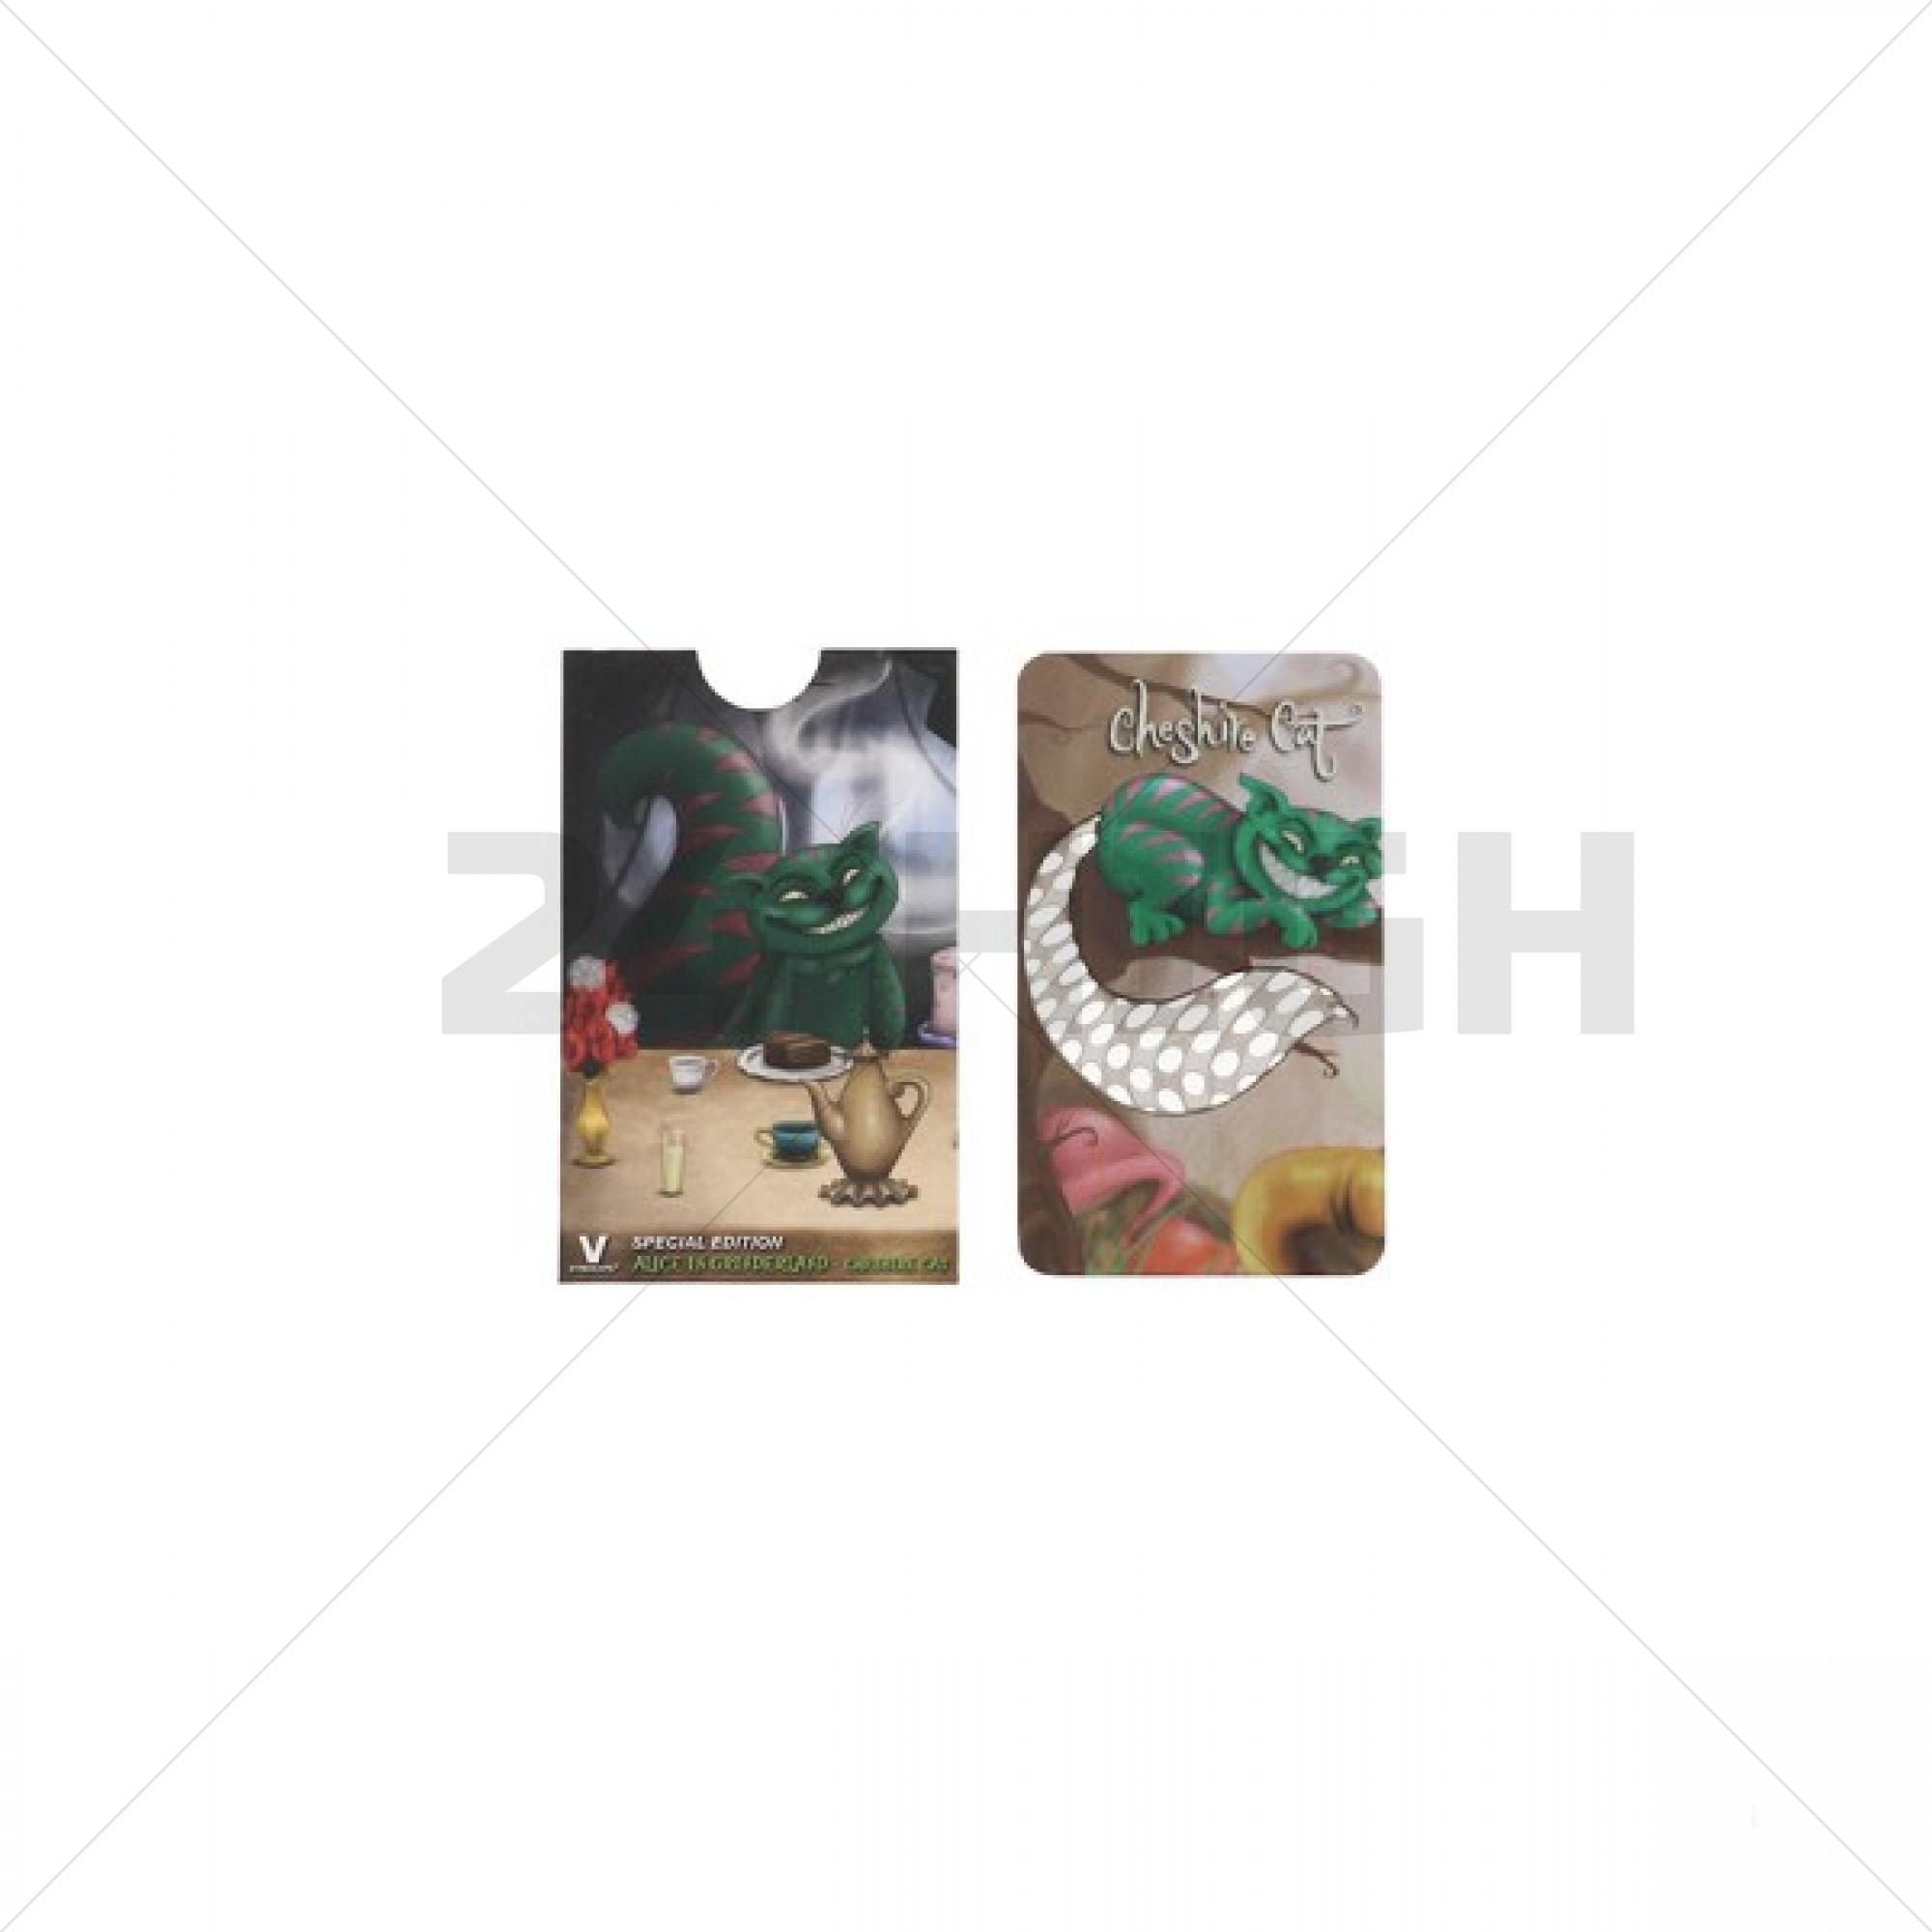 Card Grinder Alice in Grinderland - Cheshire